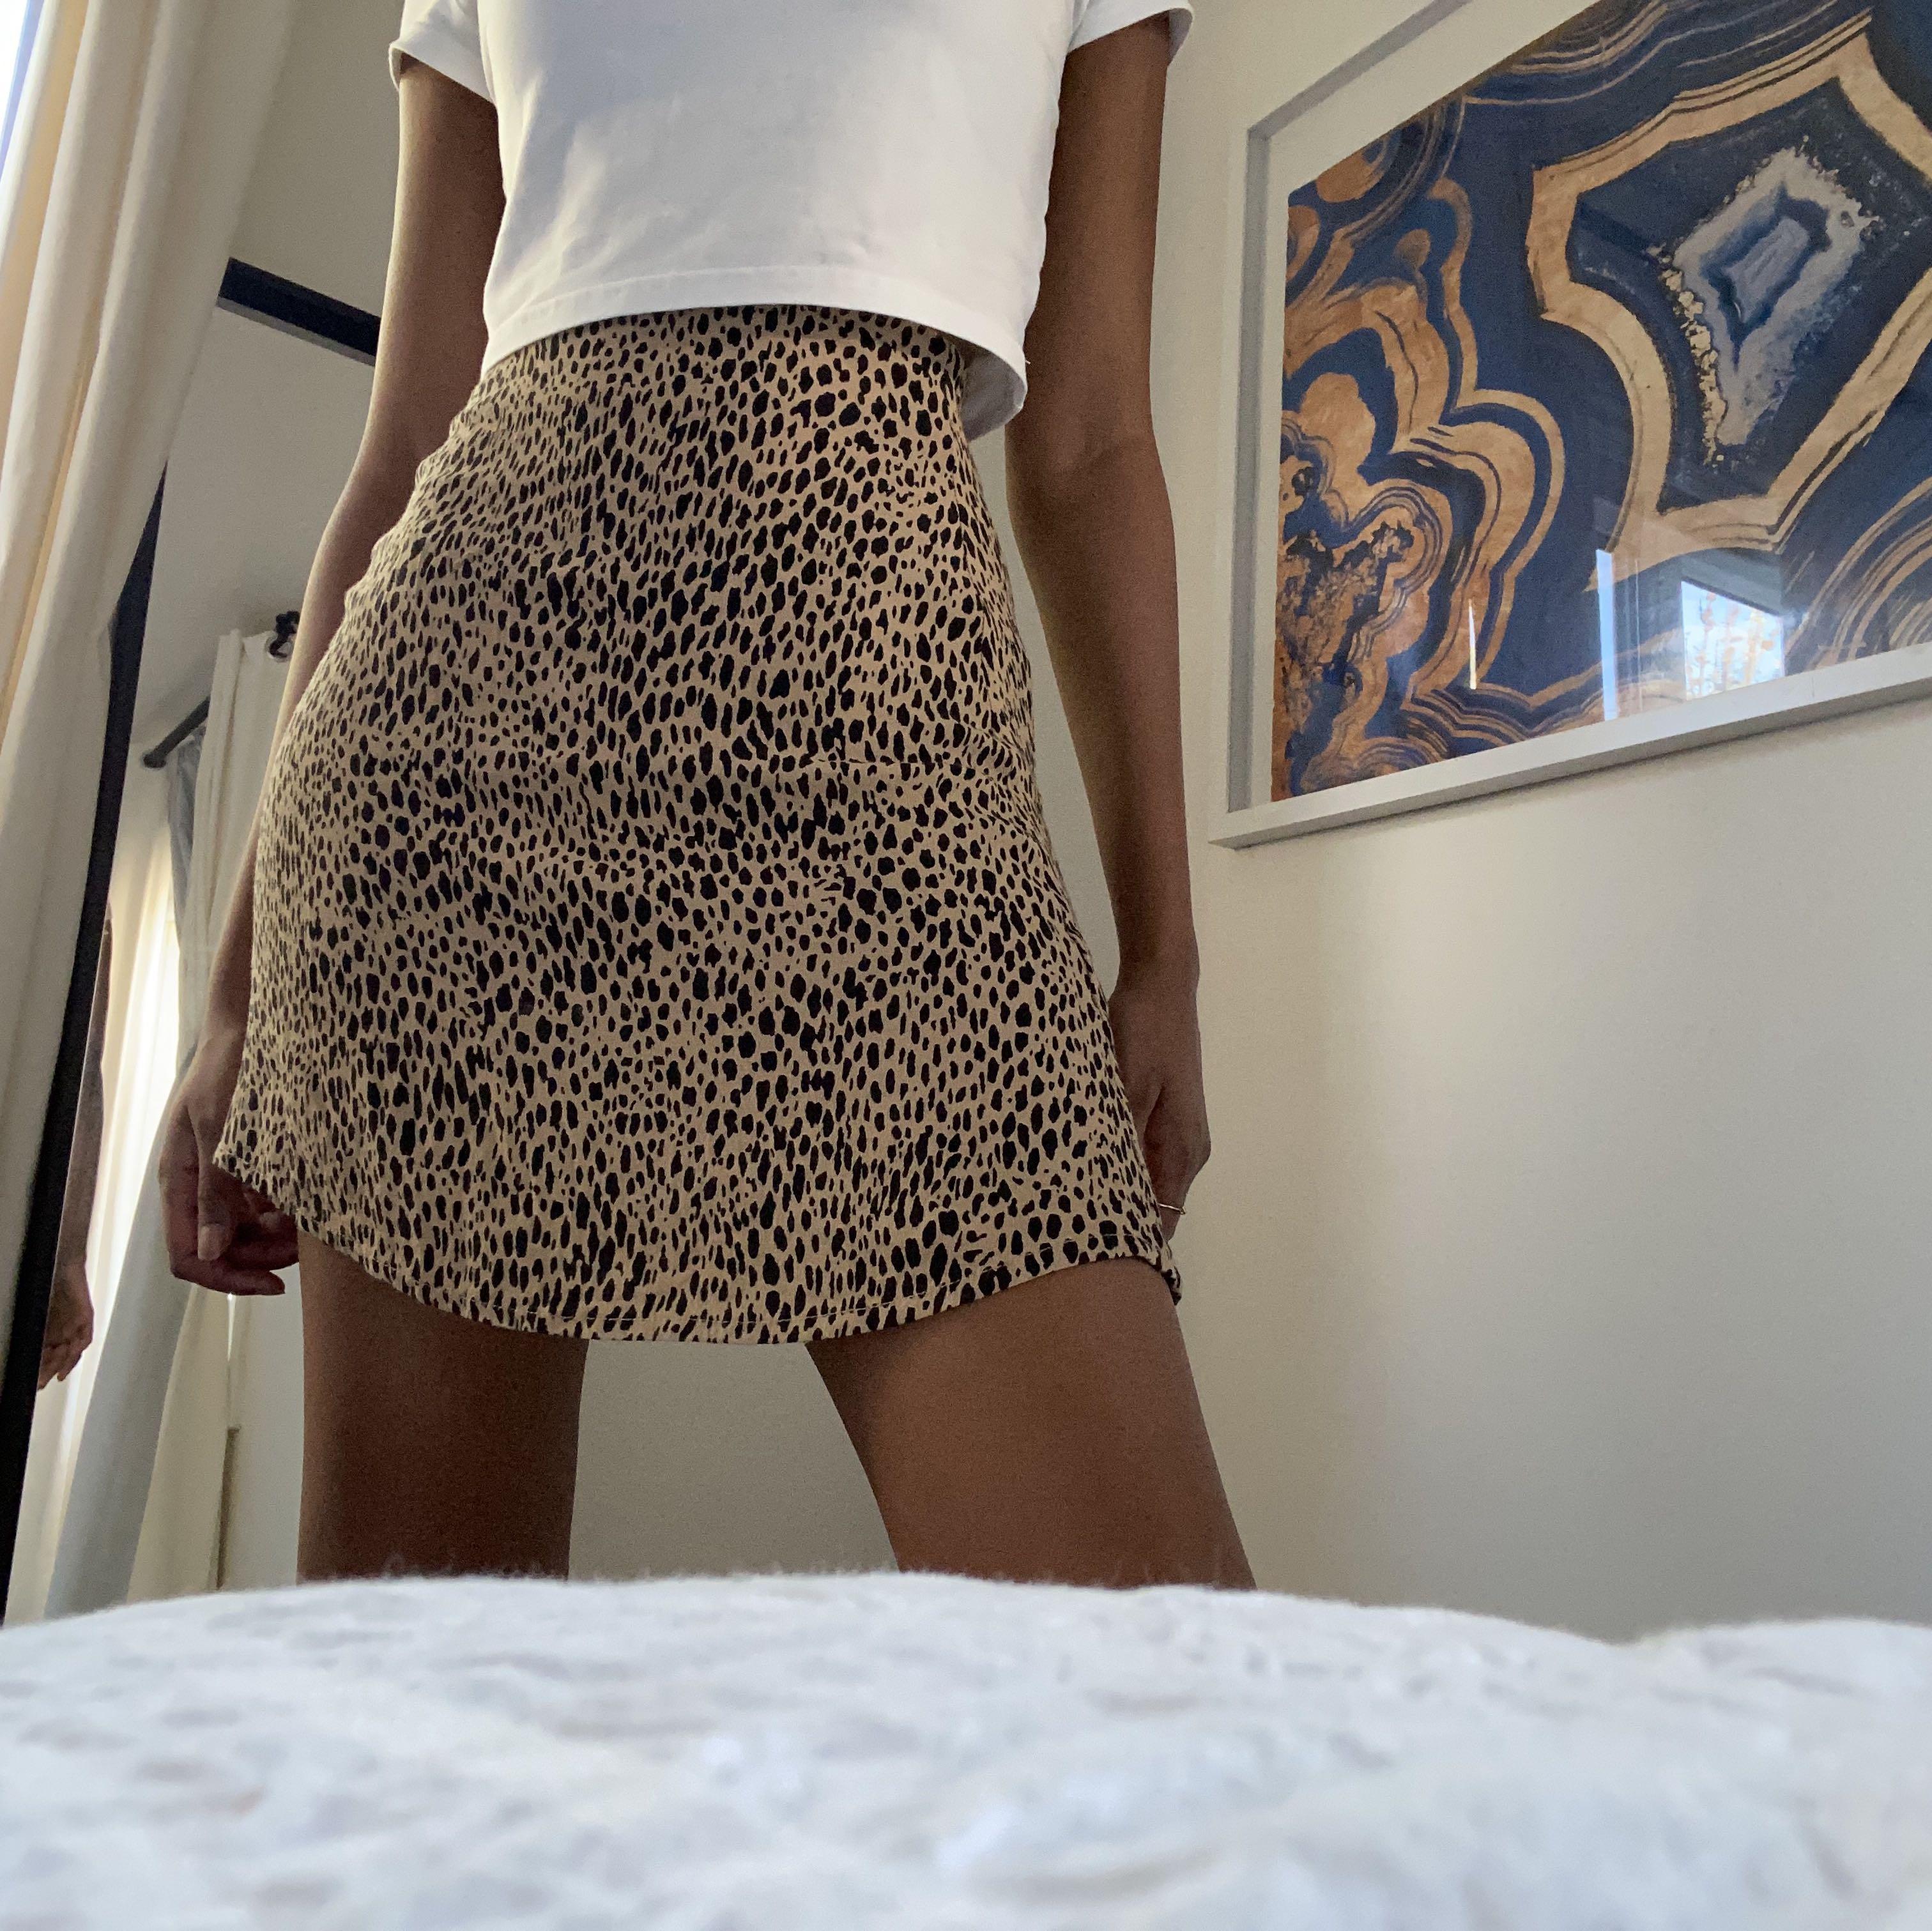 Brandy Melville Leopard Phoebe skirt